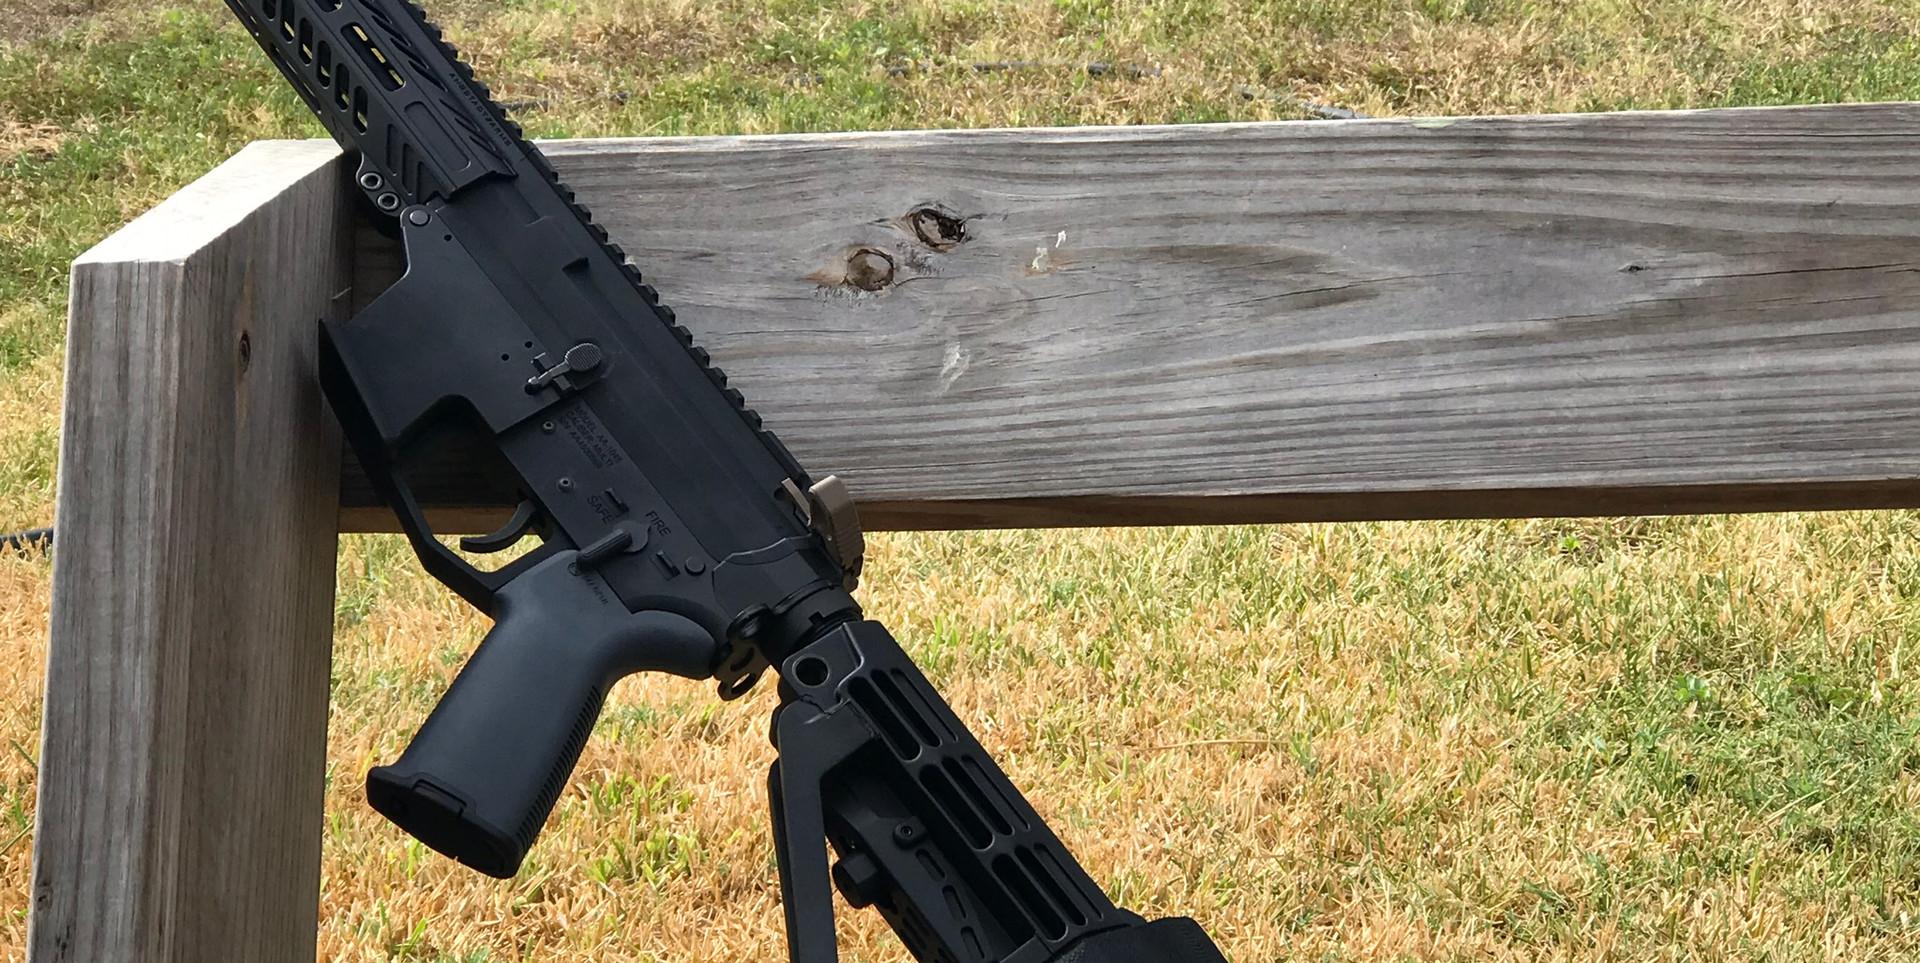 AR-15 .45 ACP PISTOL